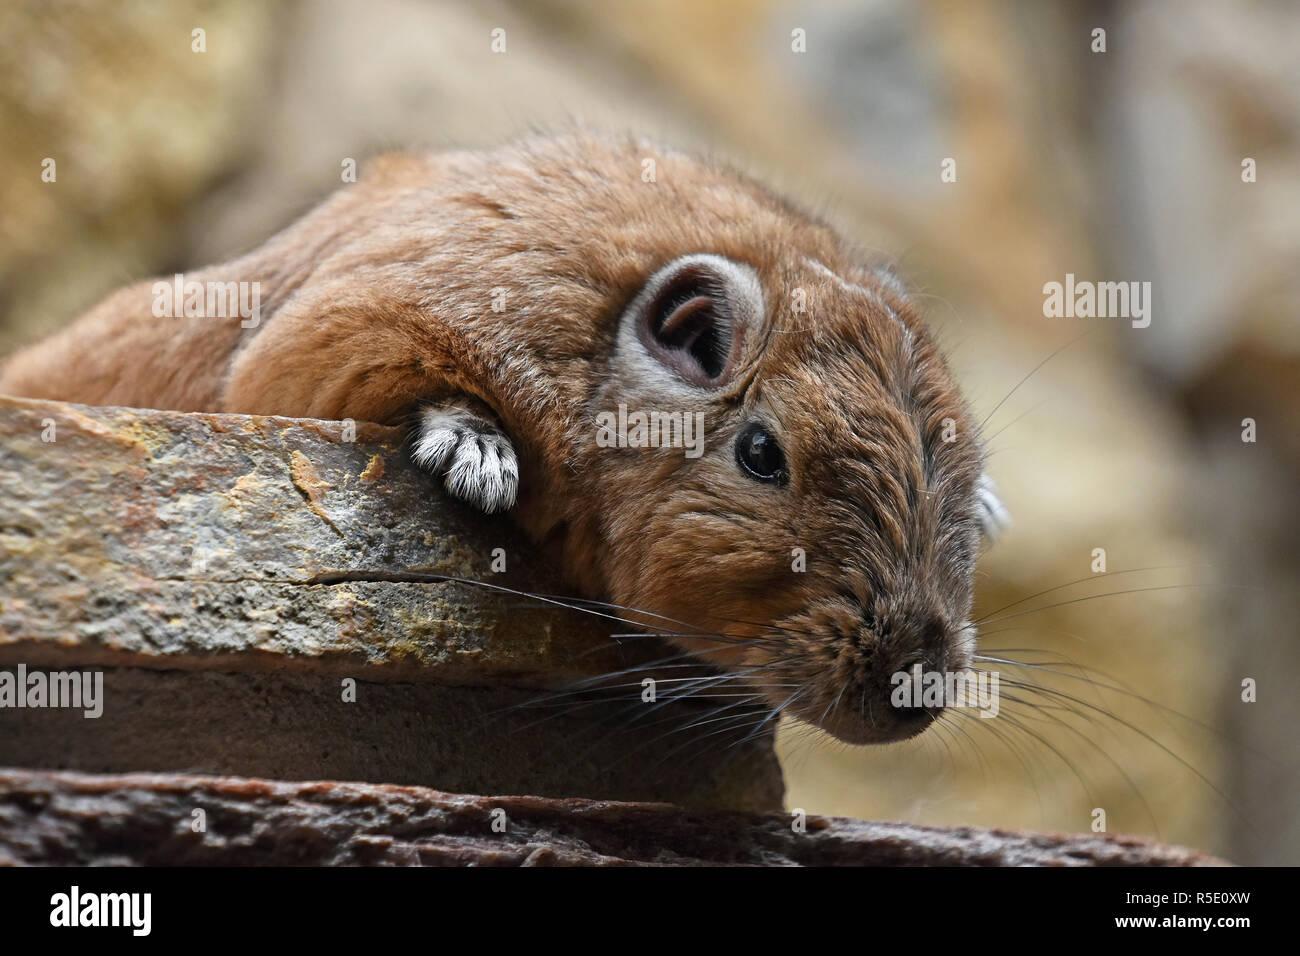 Close up portrait of African Gundi comb rat - Stock Image